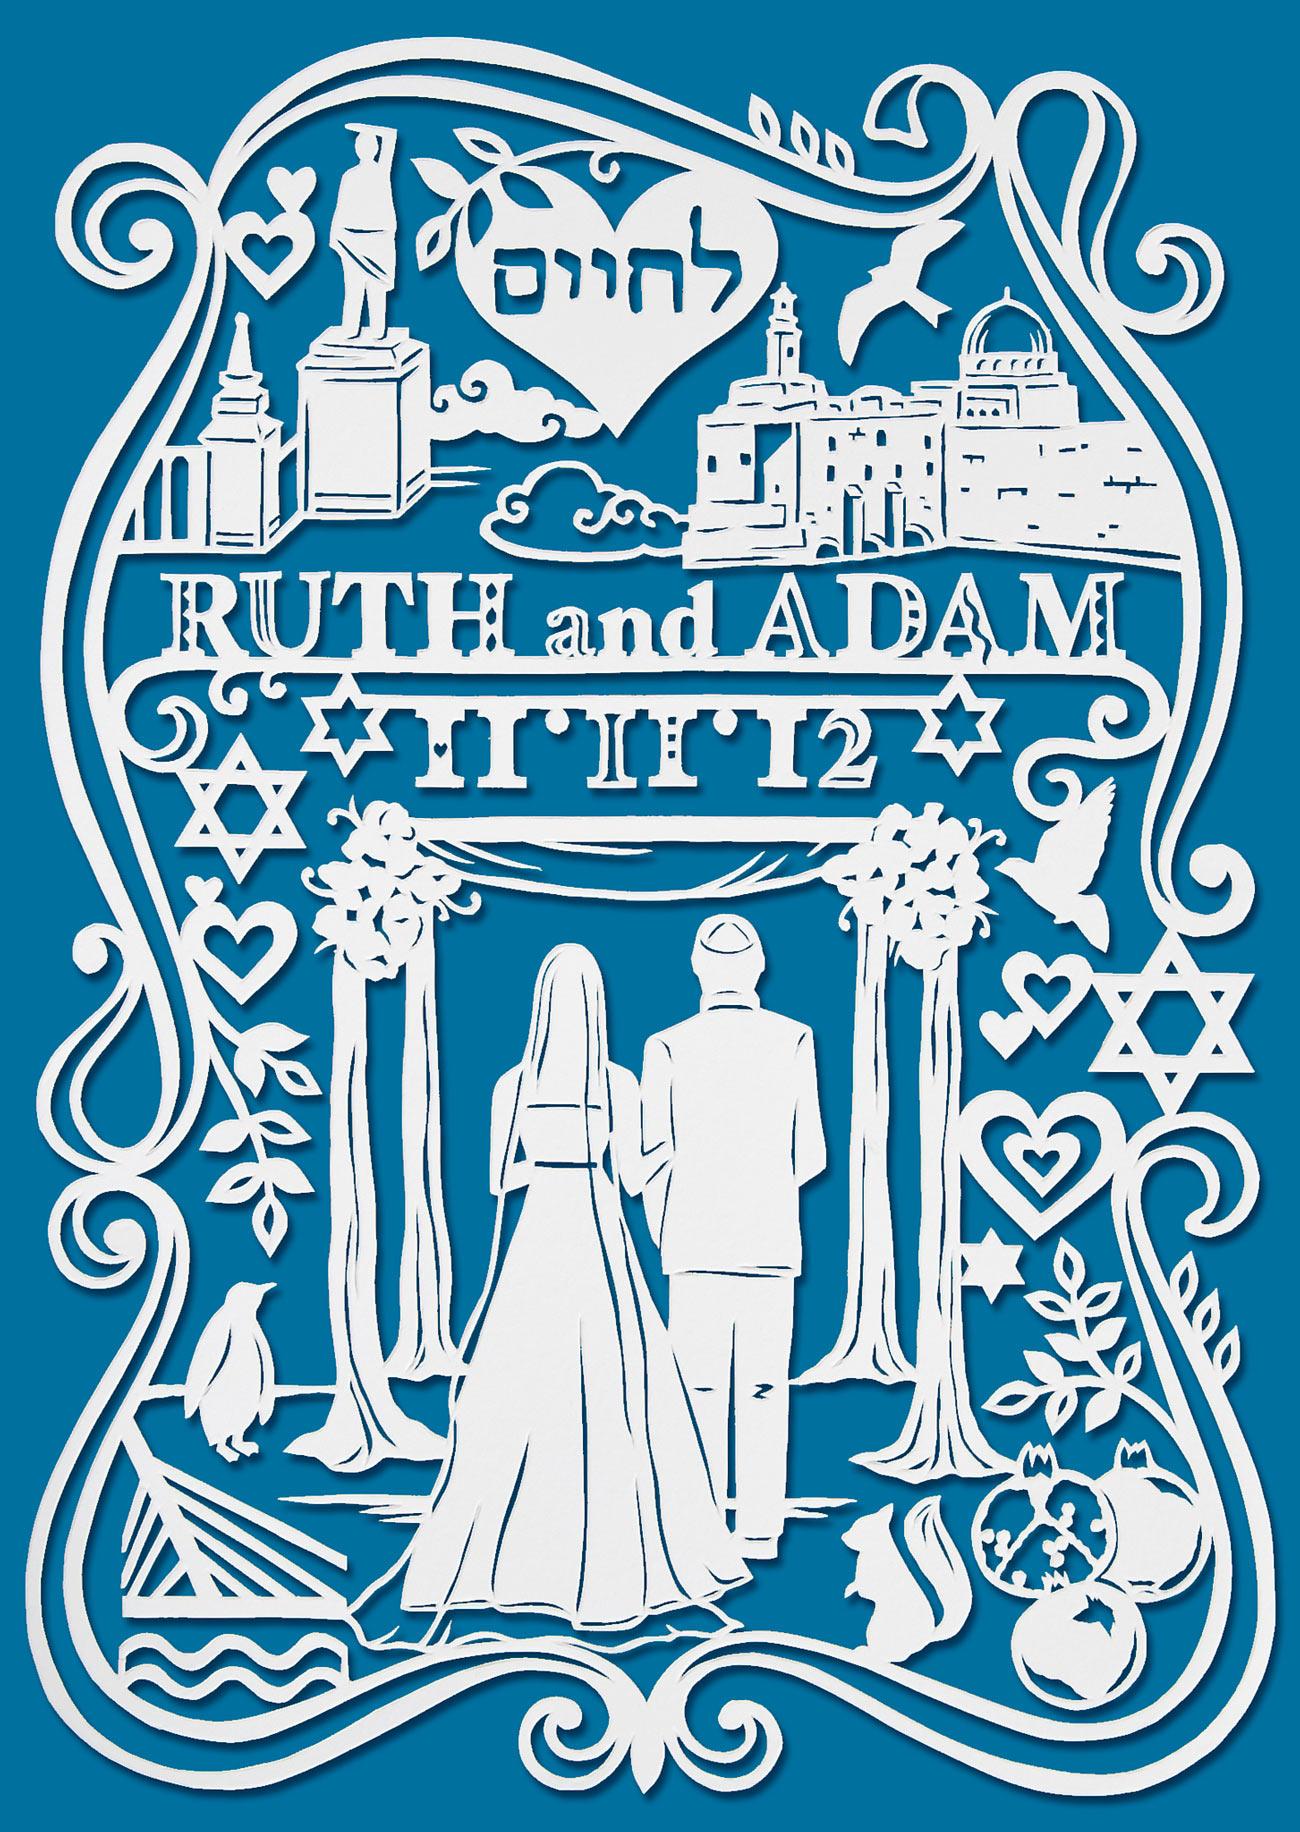 papercut illustration for anniversary, jewish wedding